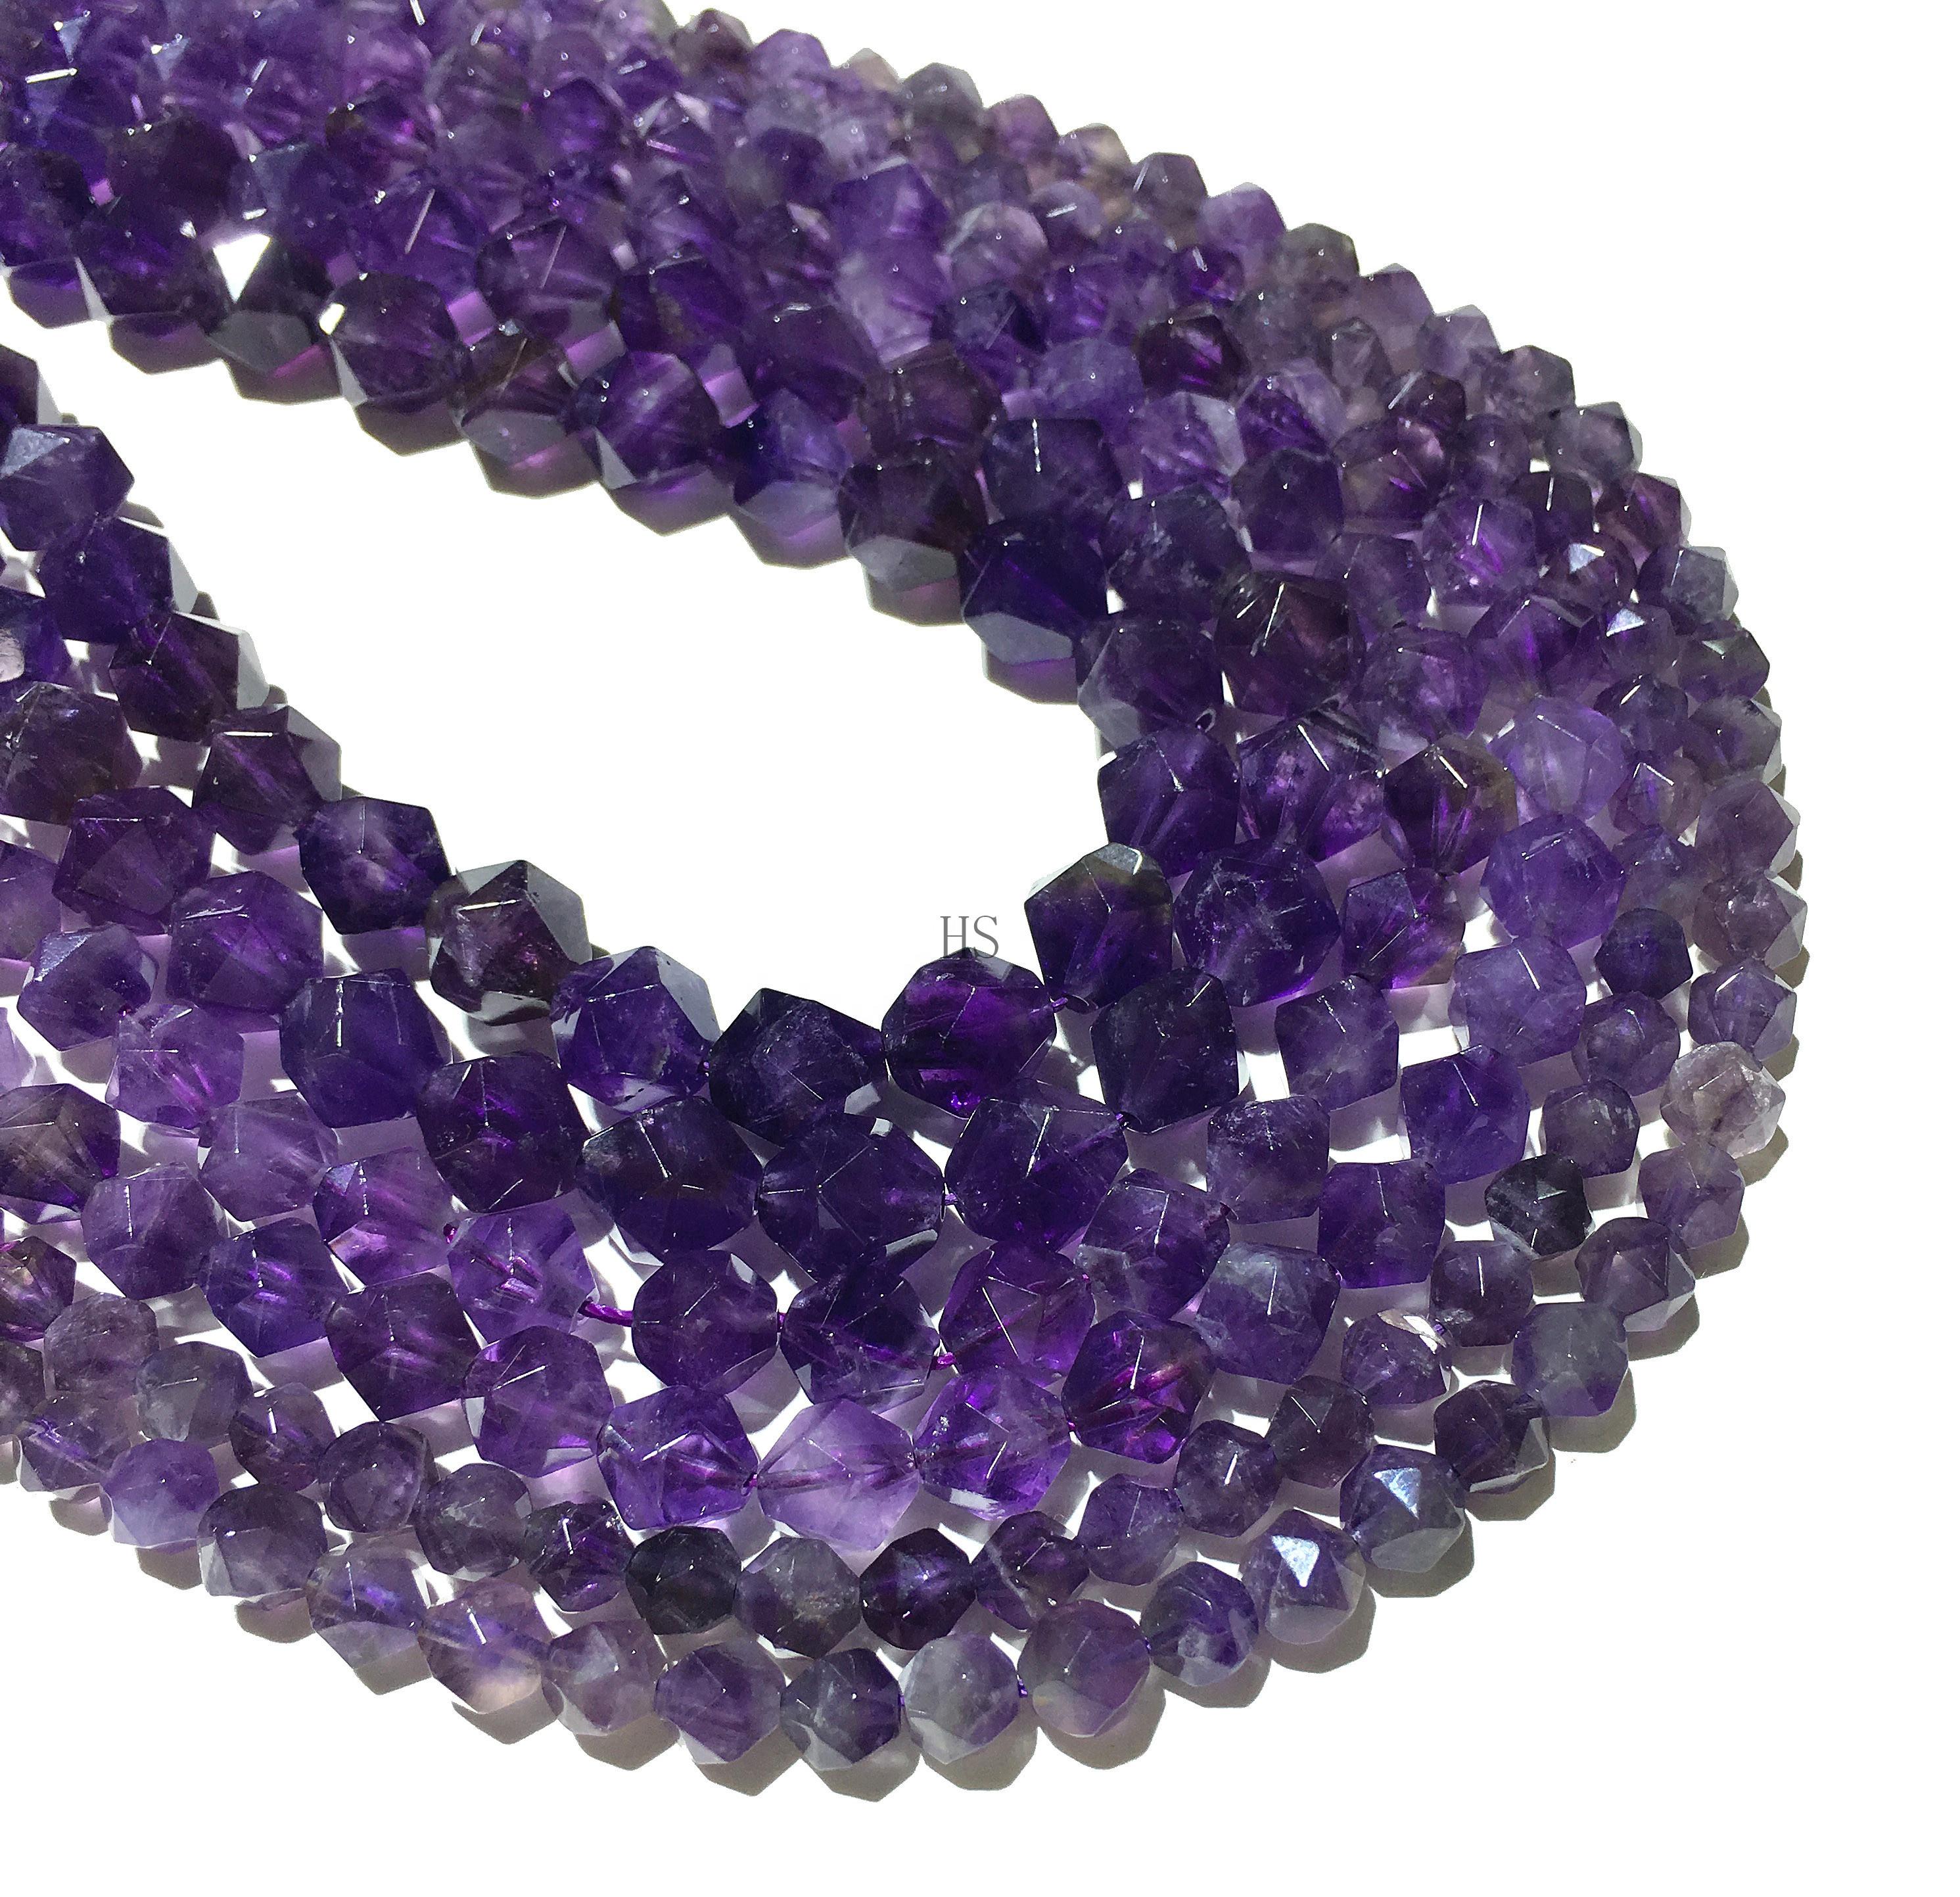 Purple Amethyst Flat Oval Beads 6*8mm for DIY Jewelry Making